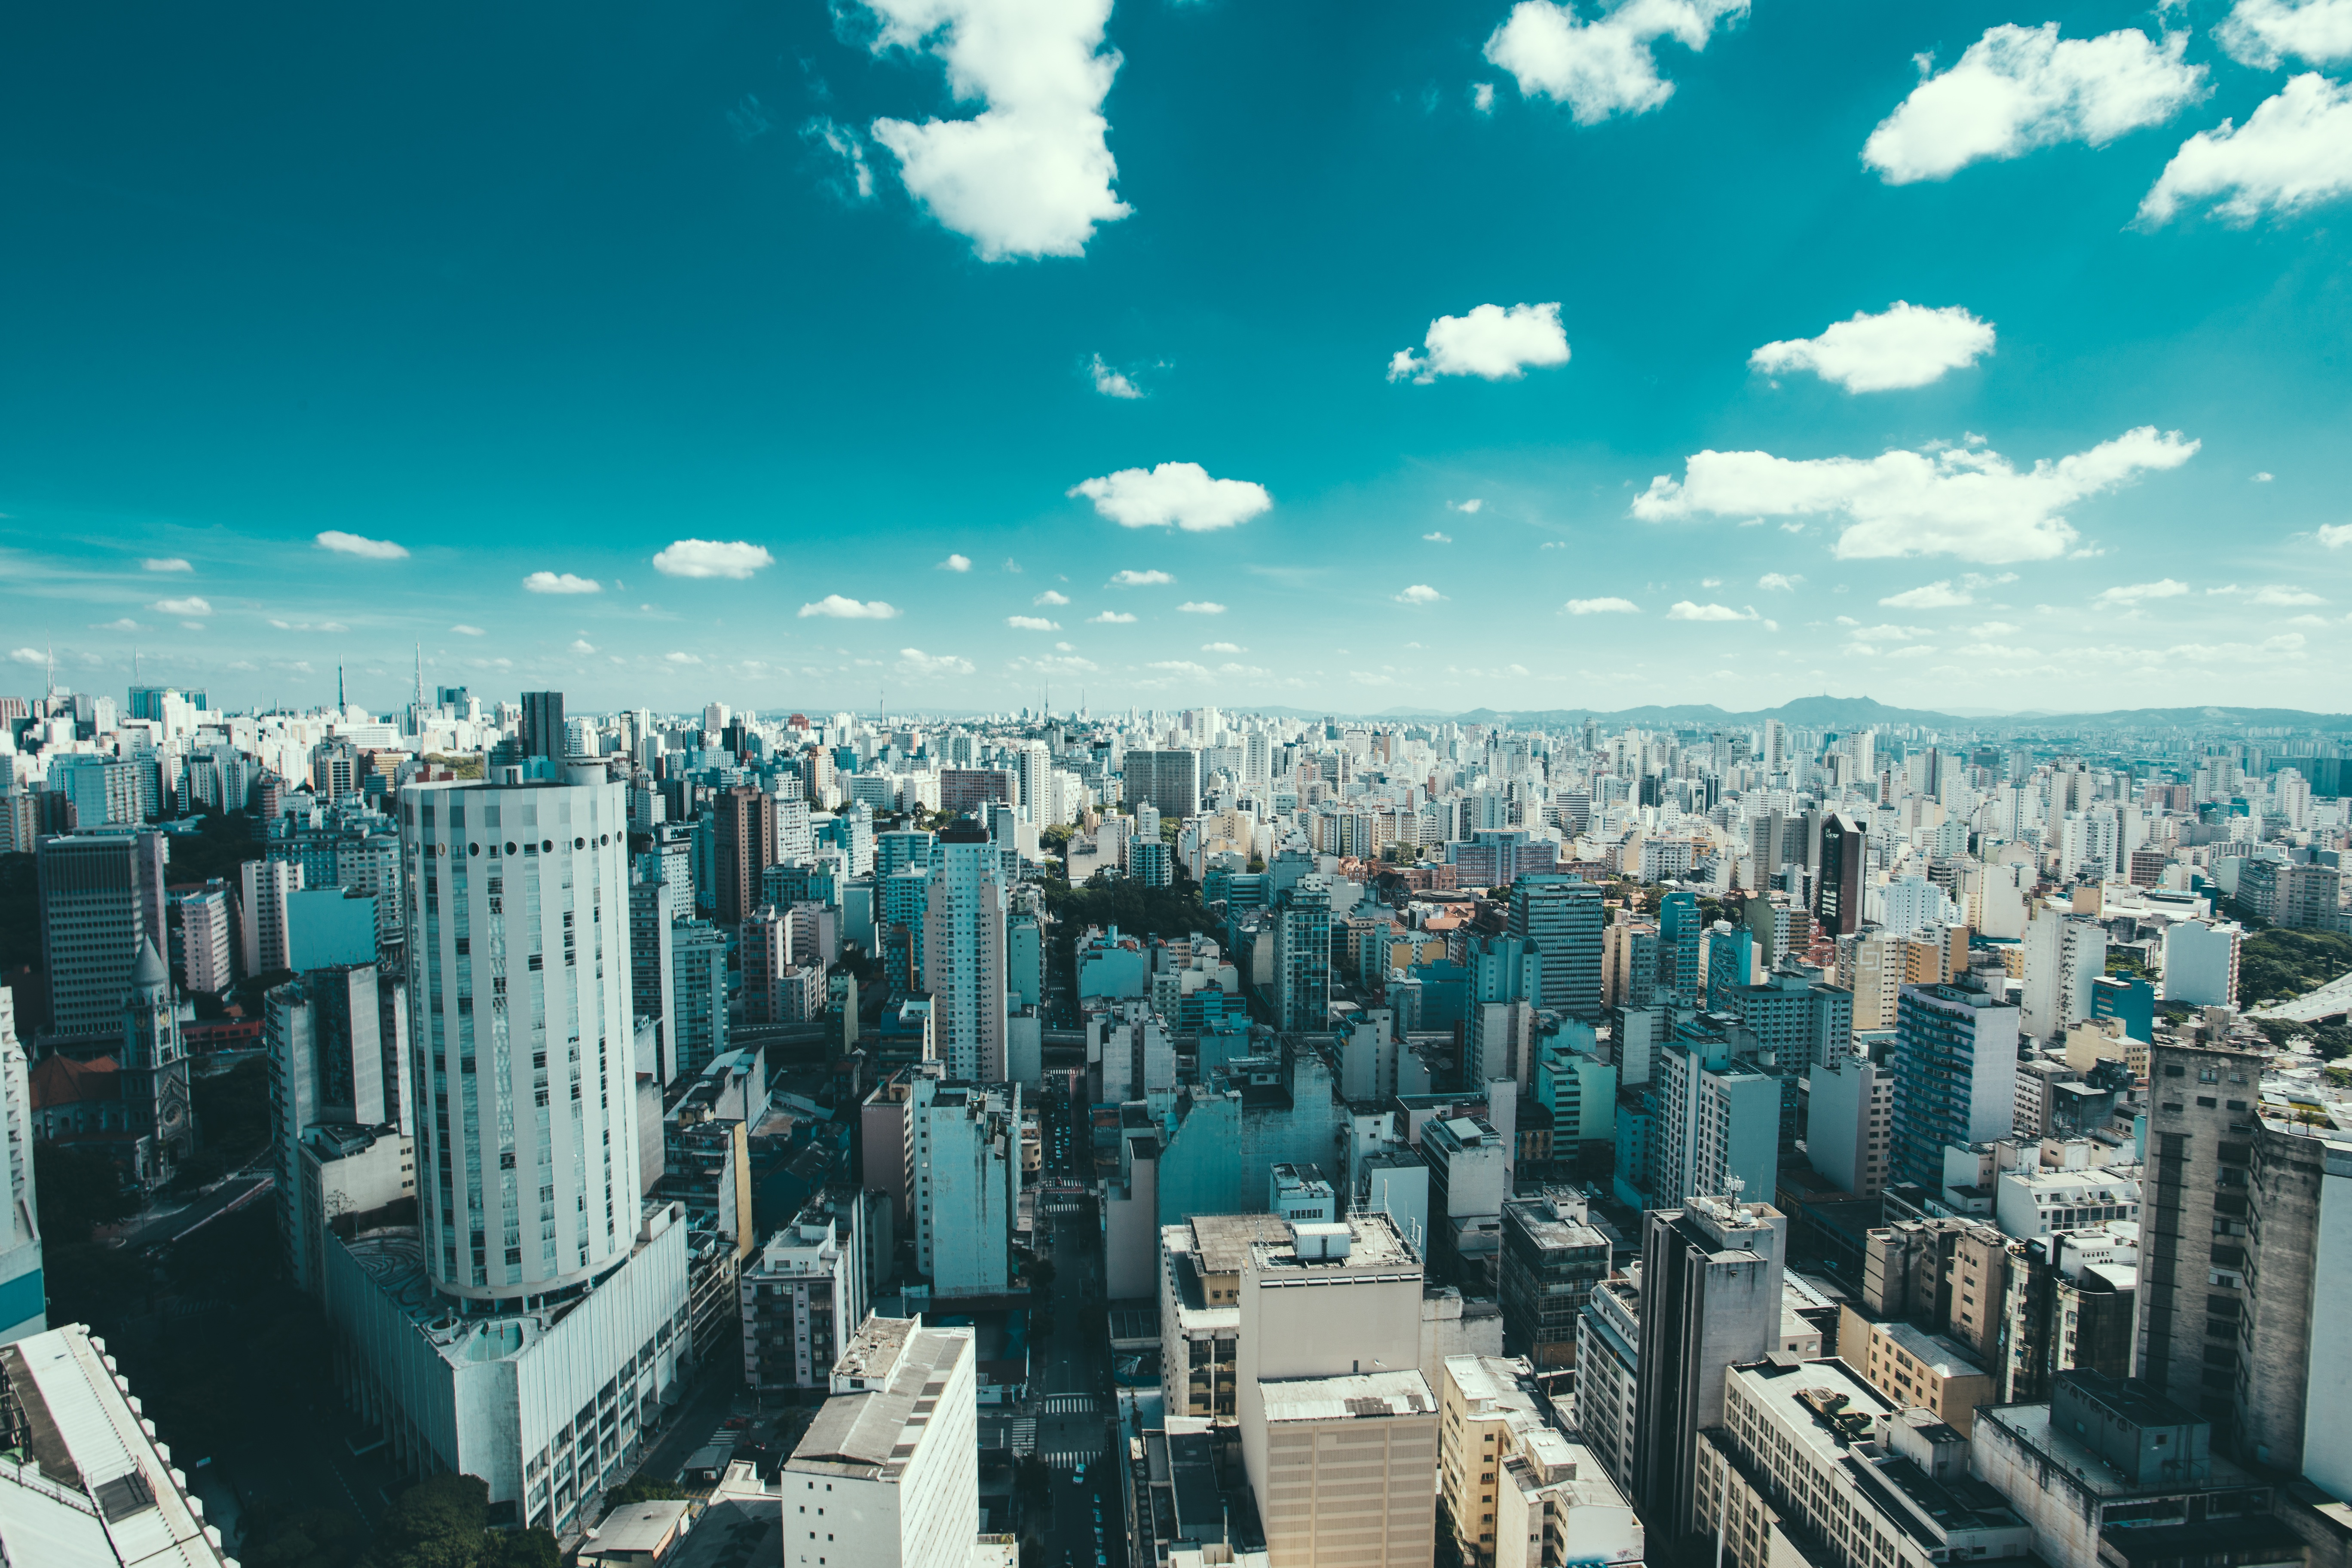 Jandira - São Paulo